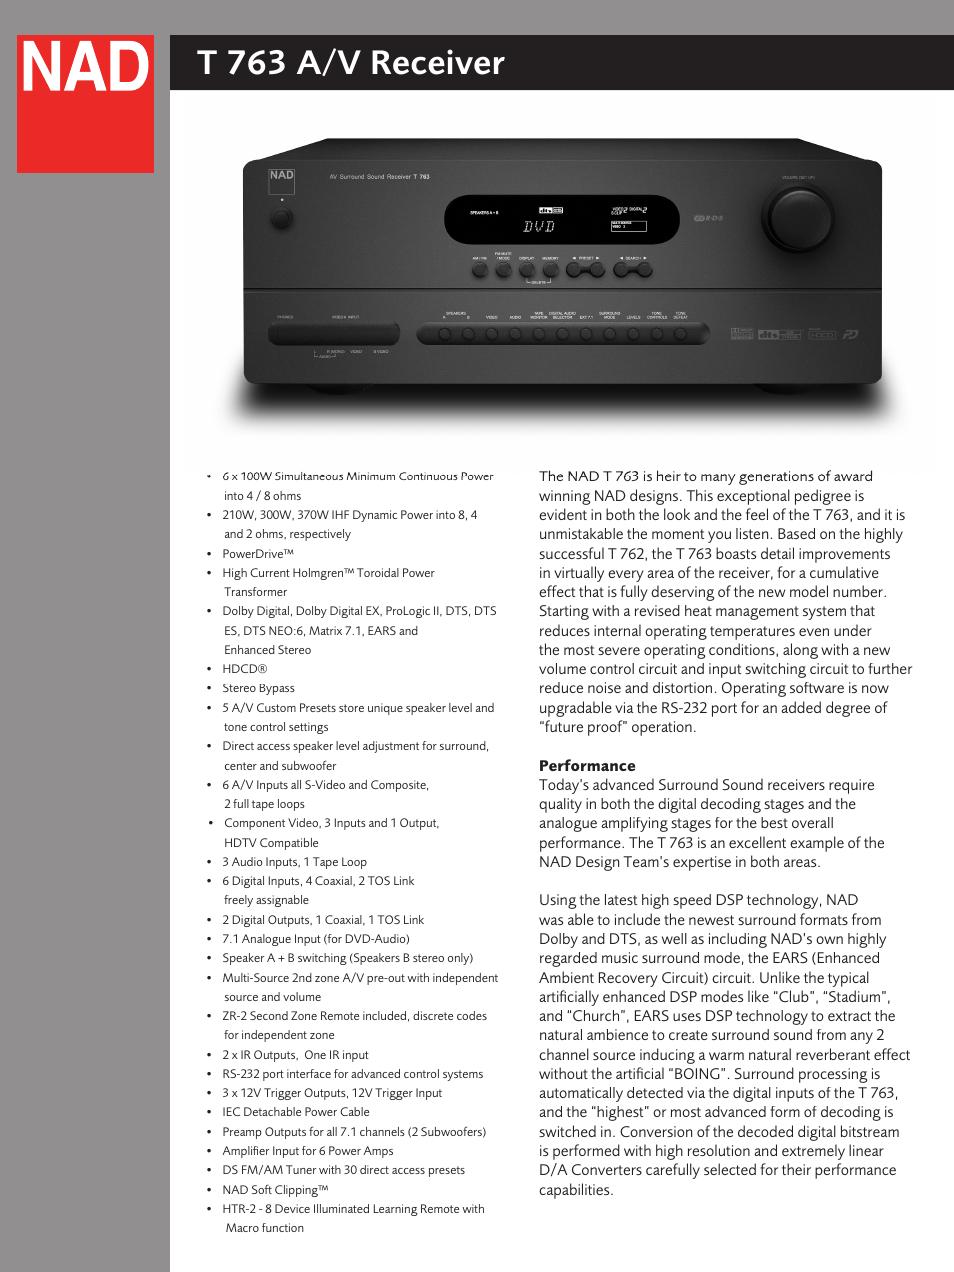 nad t 763 user manual 4 pages rh manualsdir com nad t762 manual nad t763 user manual